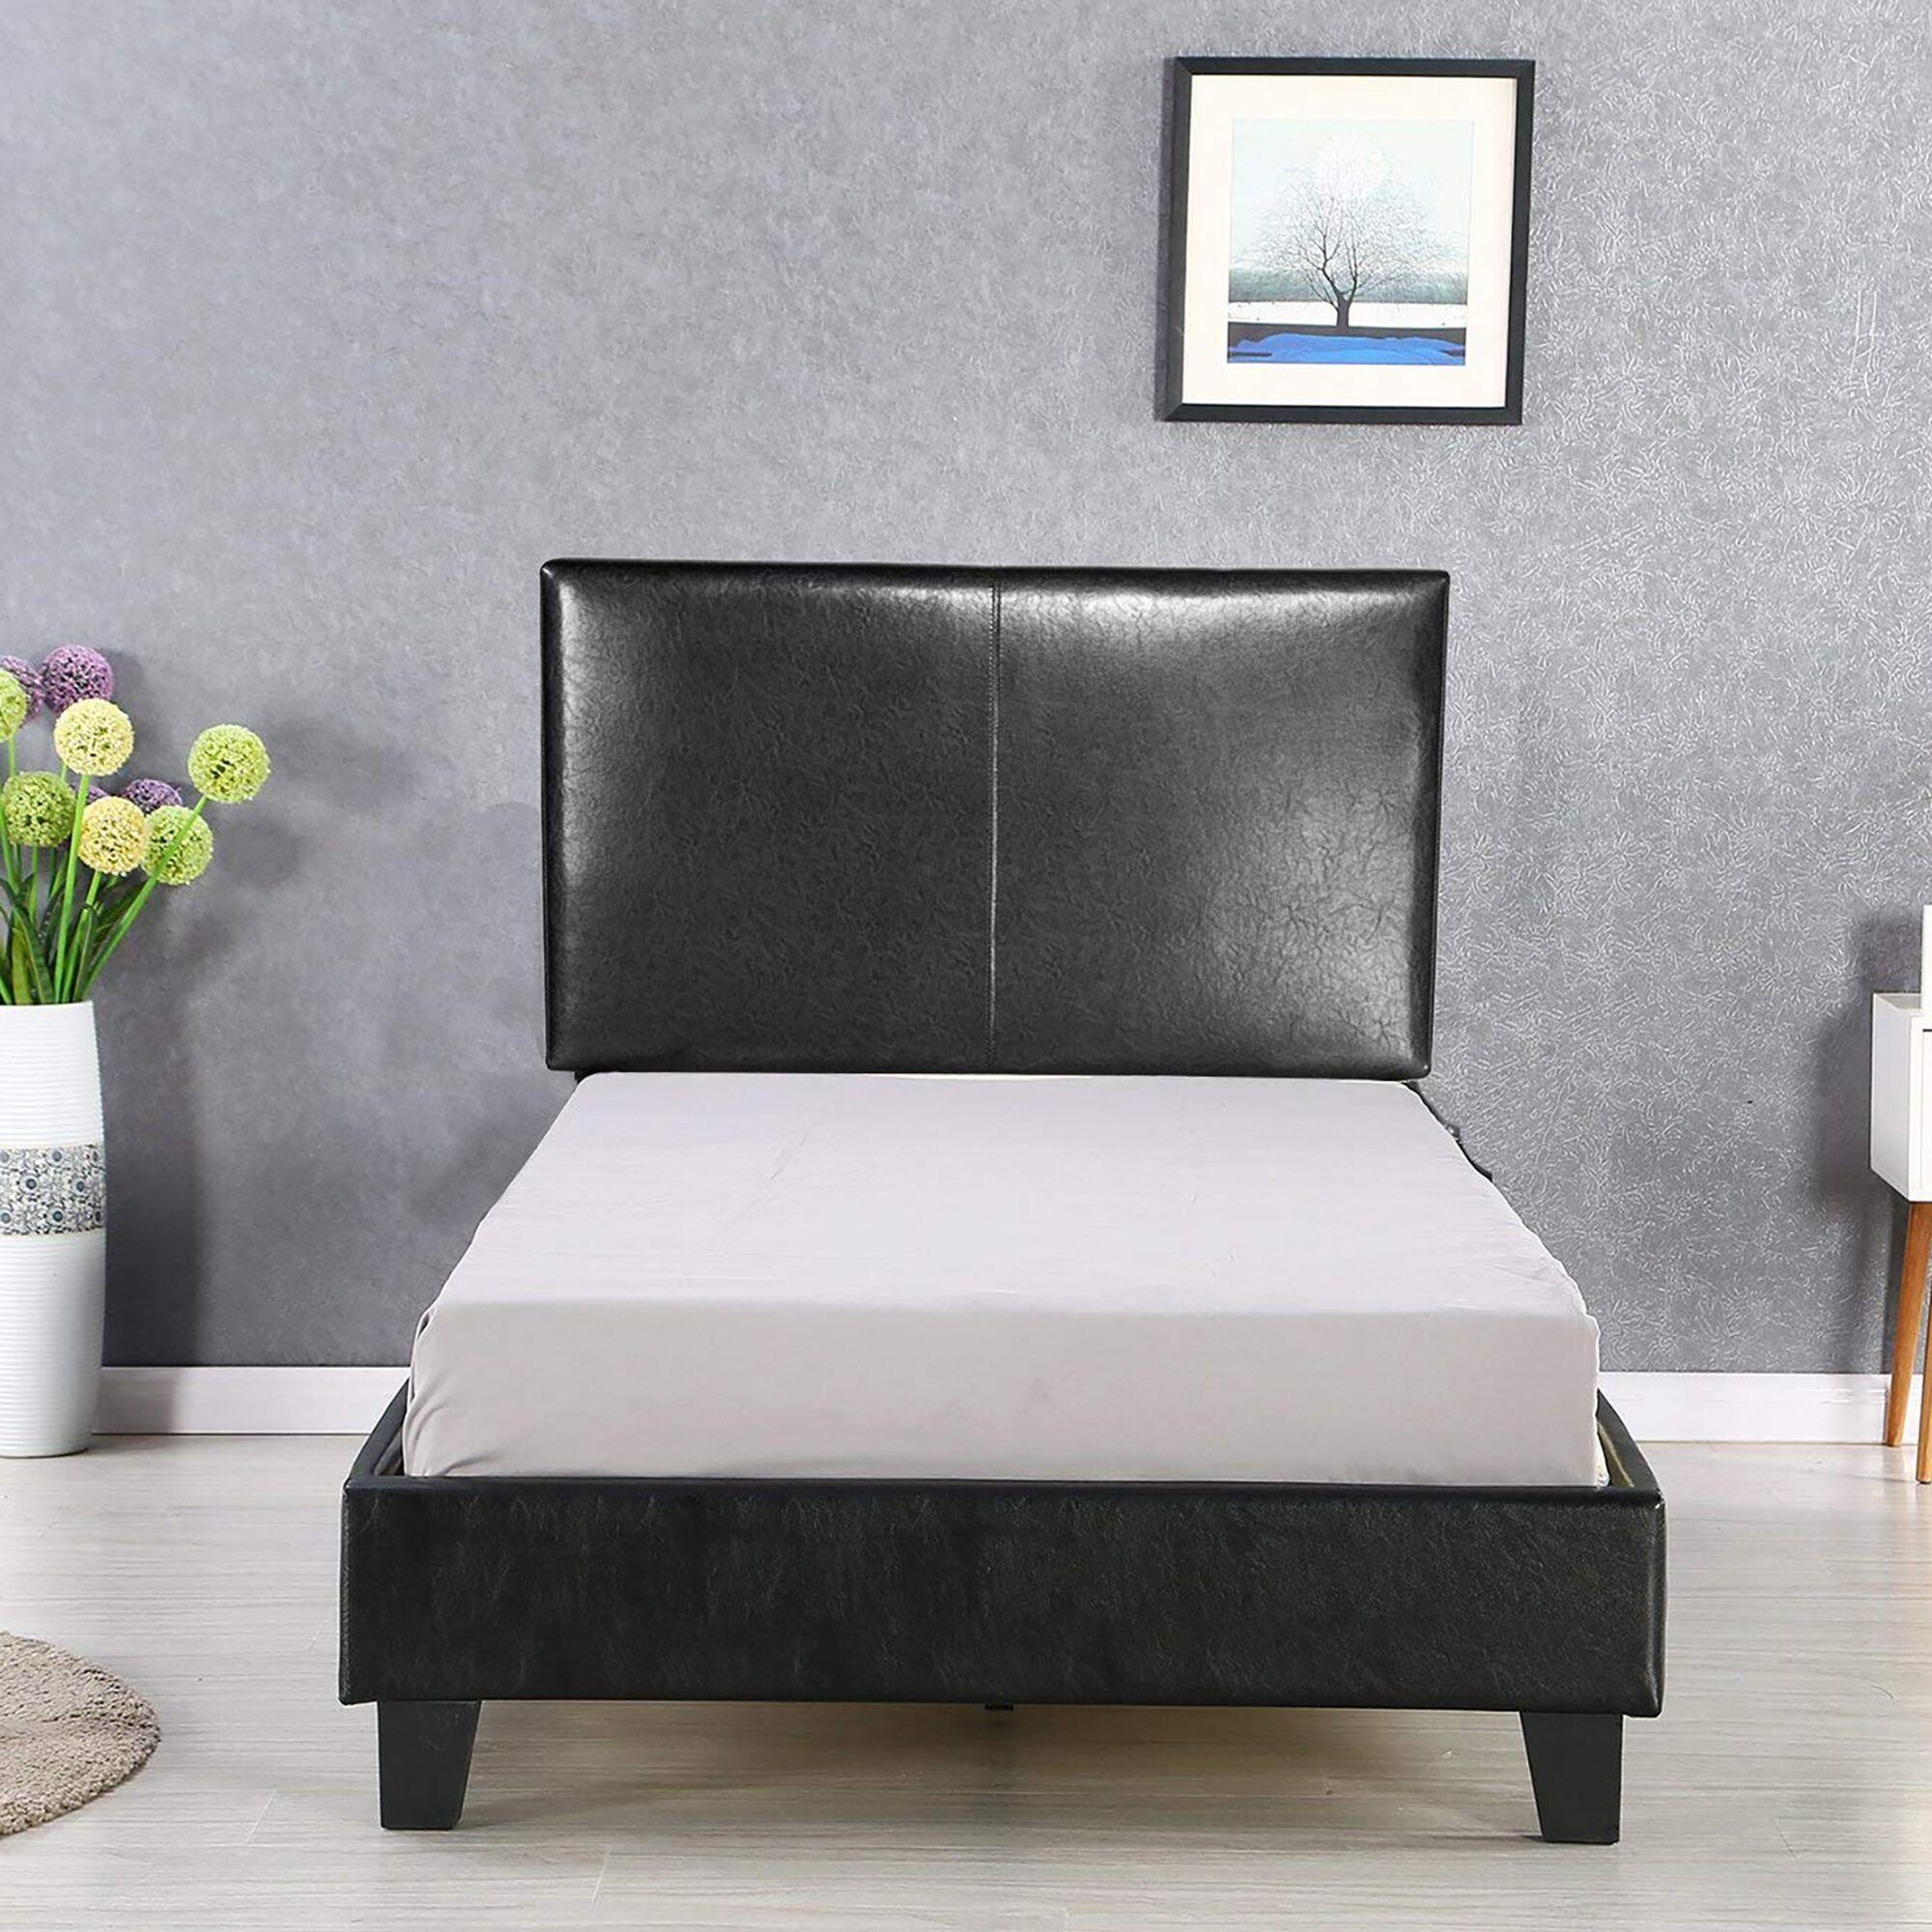 Farnham Twin Upholstered Platform Bed